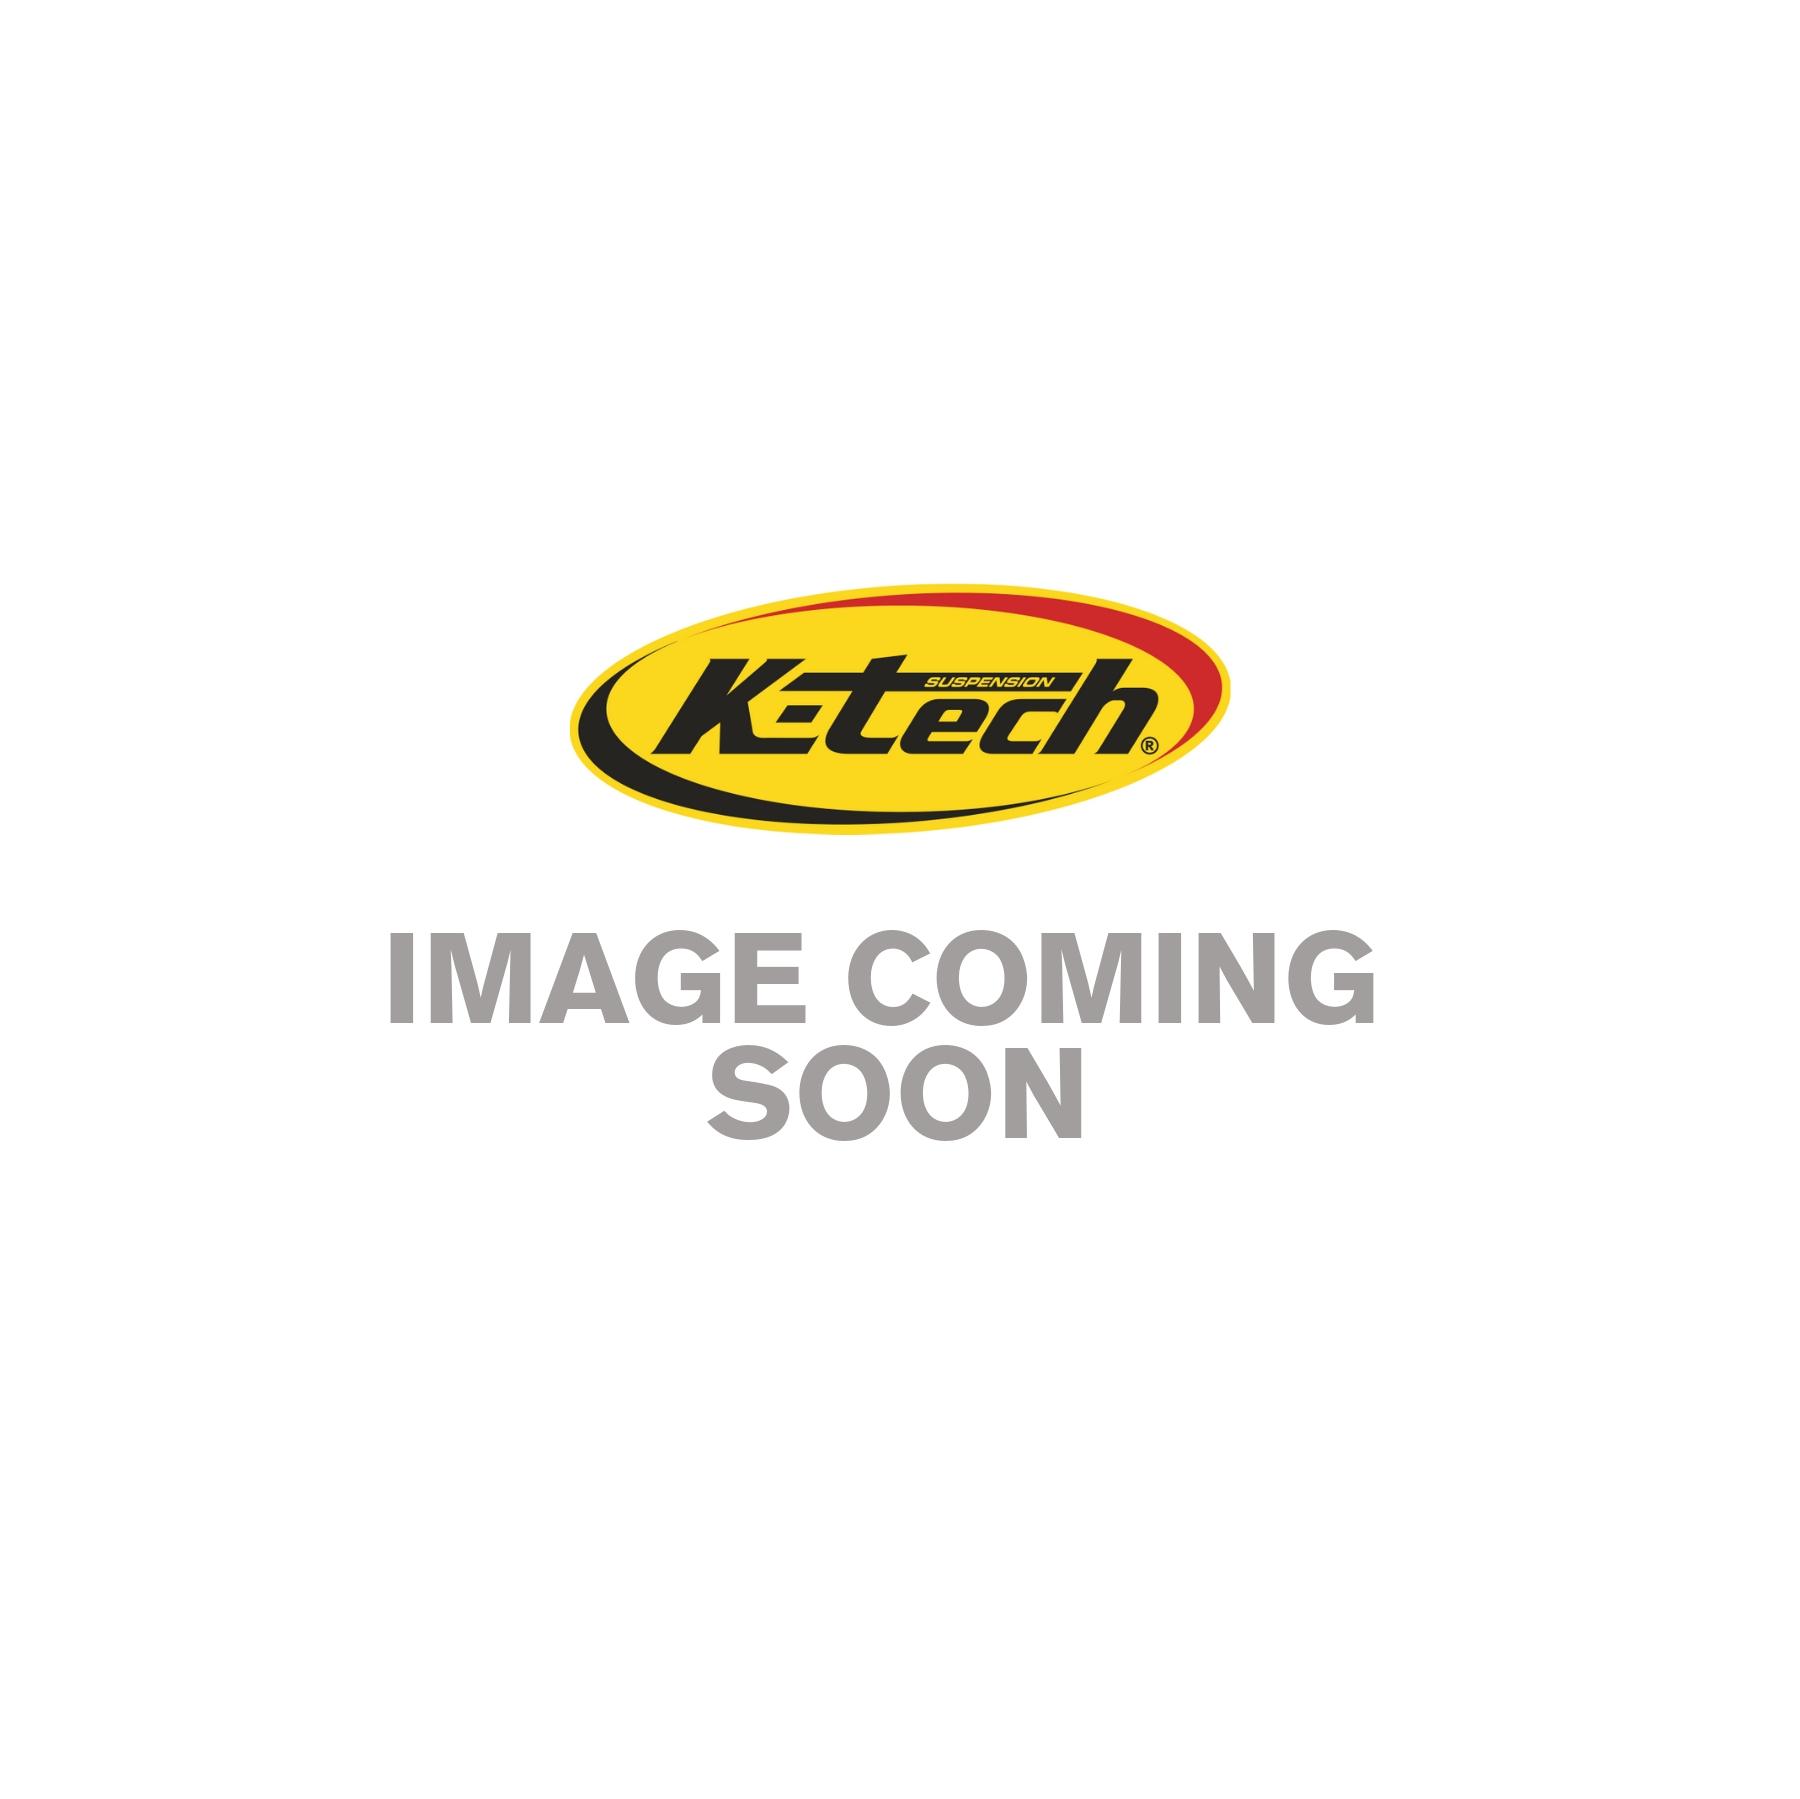 DDS Lite Shock Absorber Triumph Daytona 675/675R, Street Triple R 2006-2012